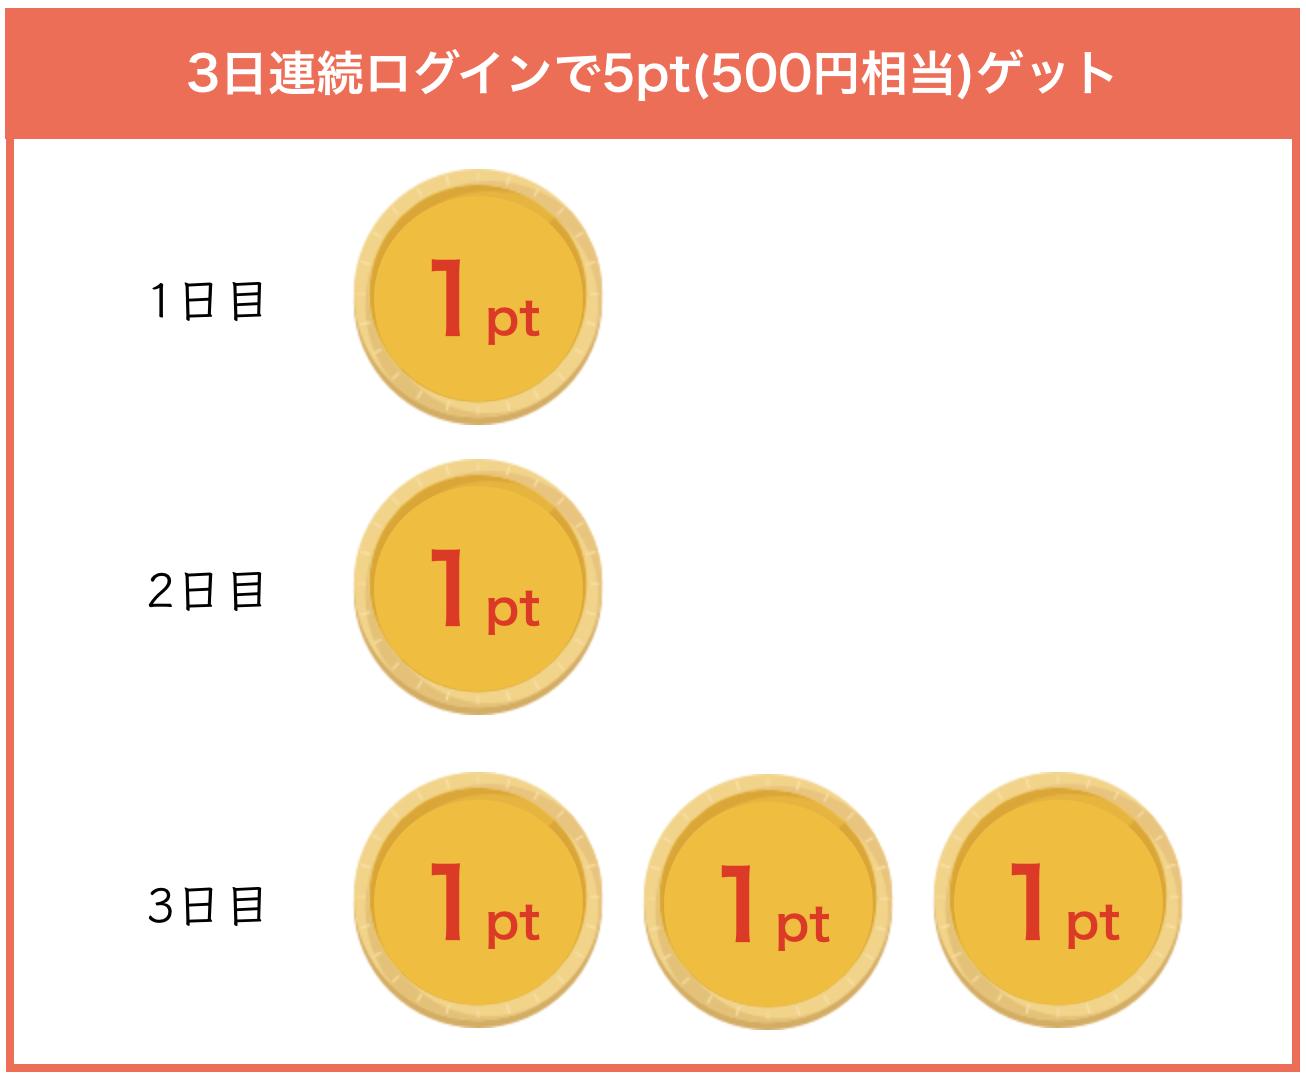 withの3日間連続ログインポイント